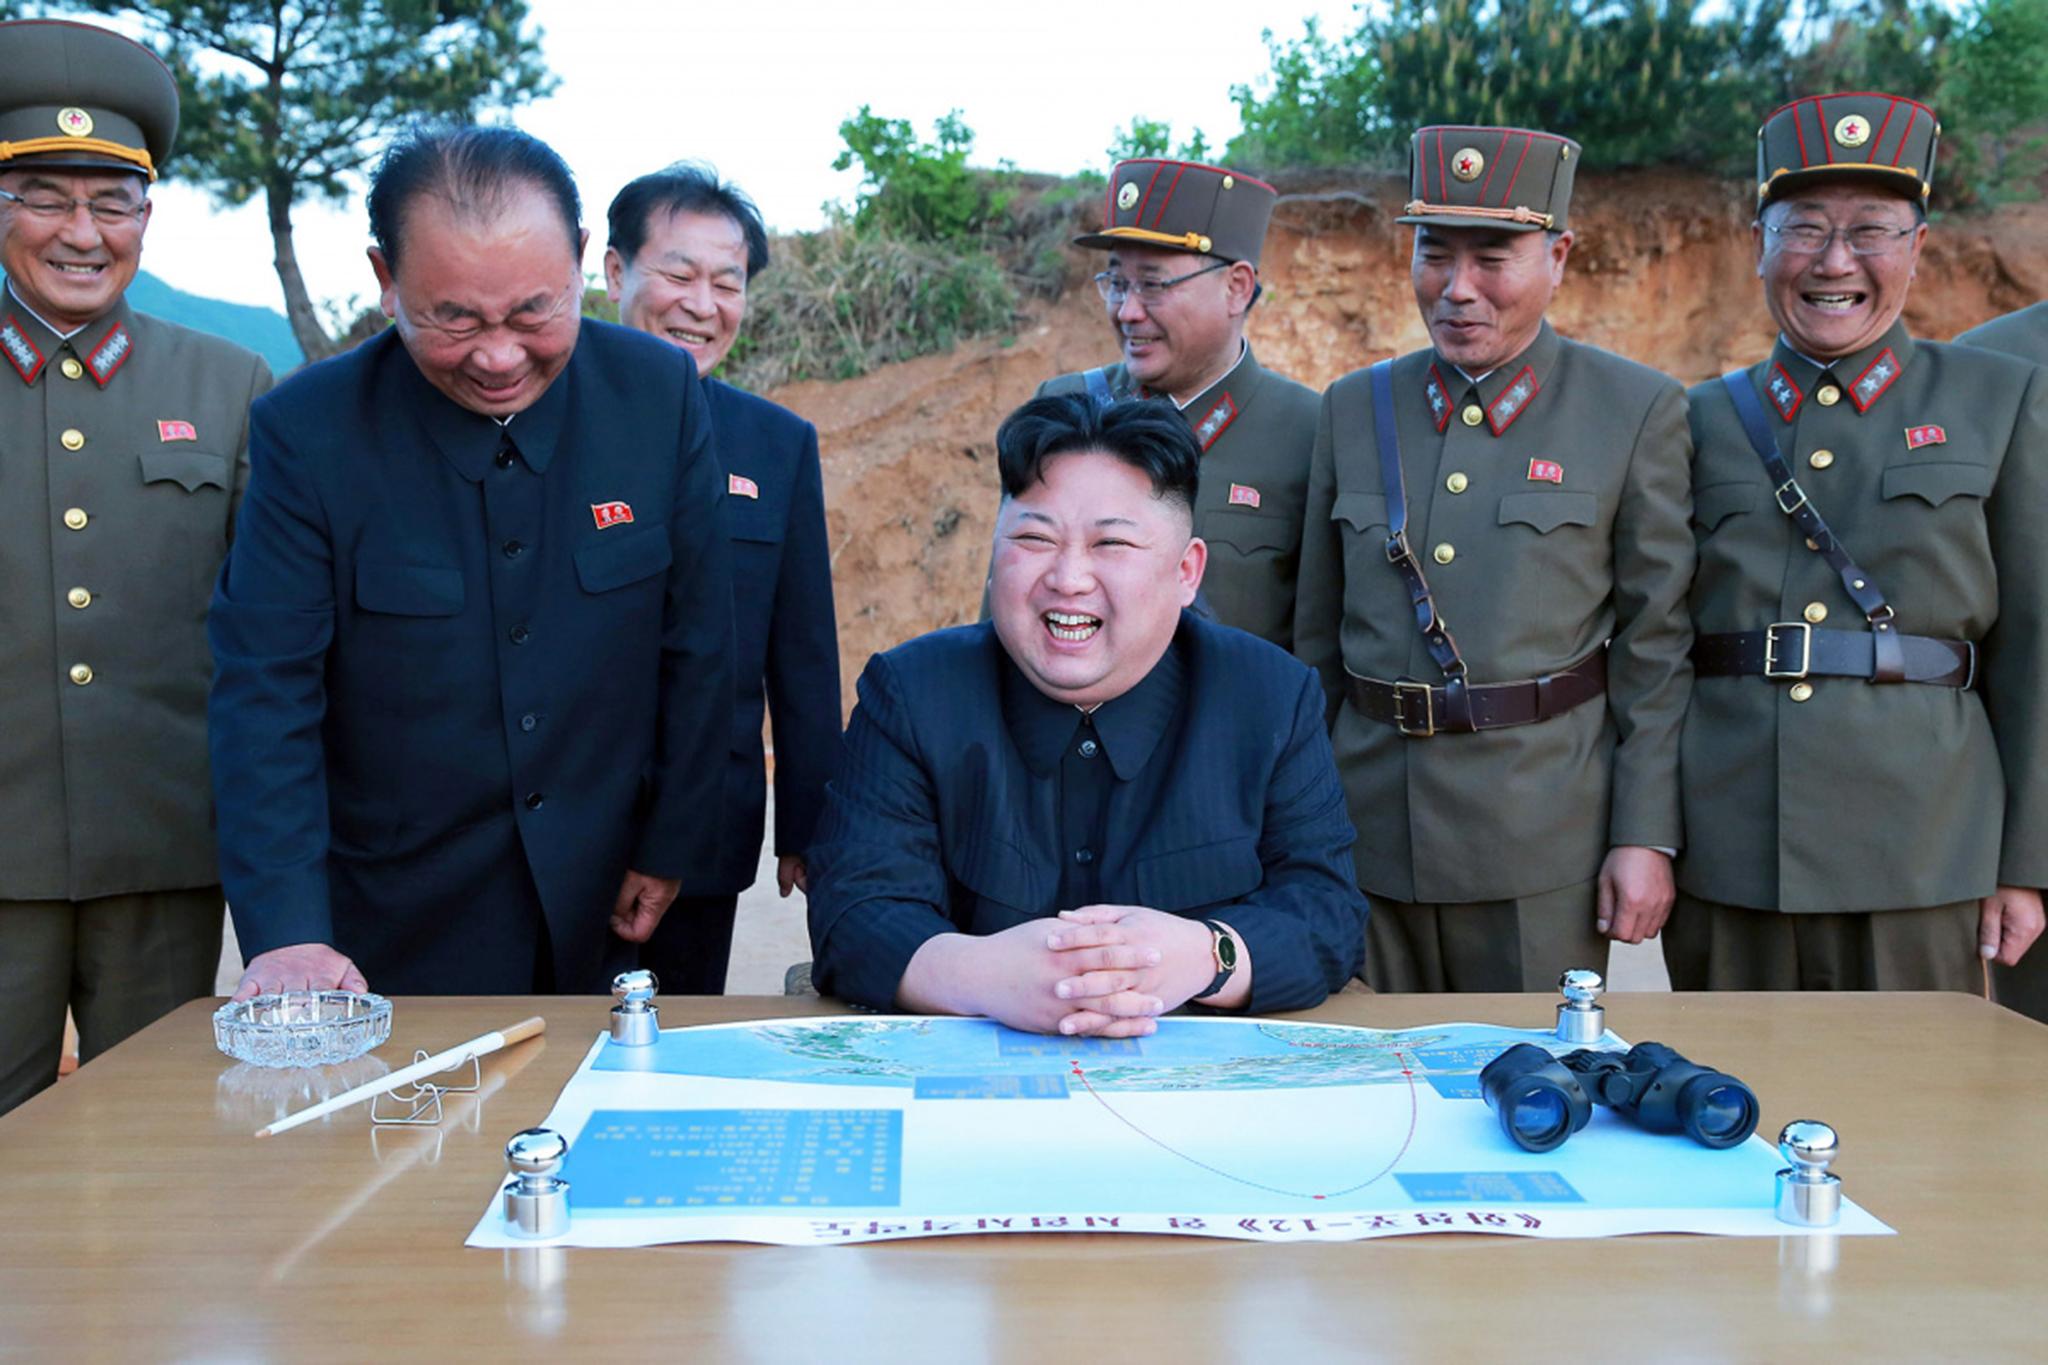 Coreias | Novo teste de míssil intercontinental coloca EUA ao alcance de Pyongyang